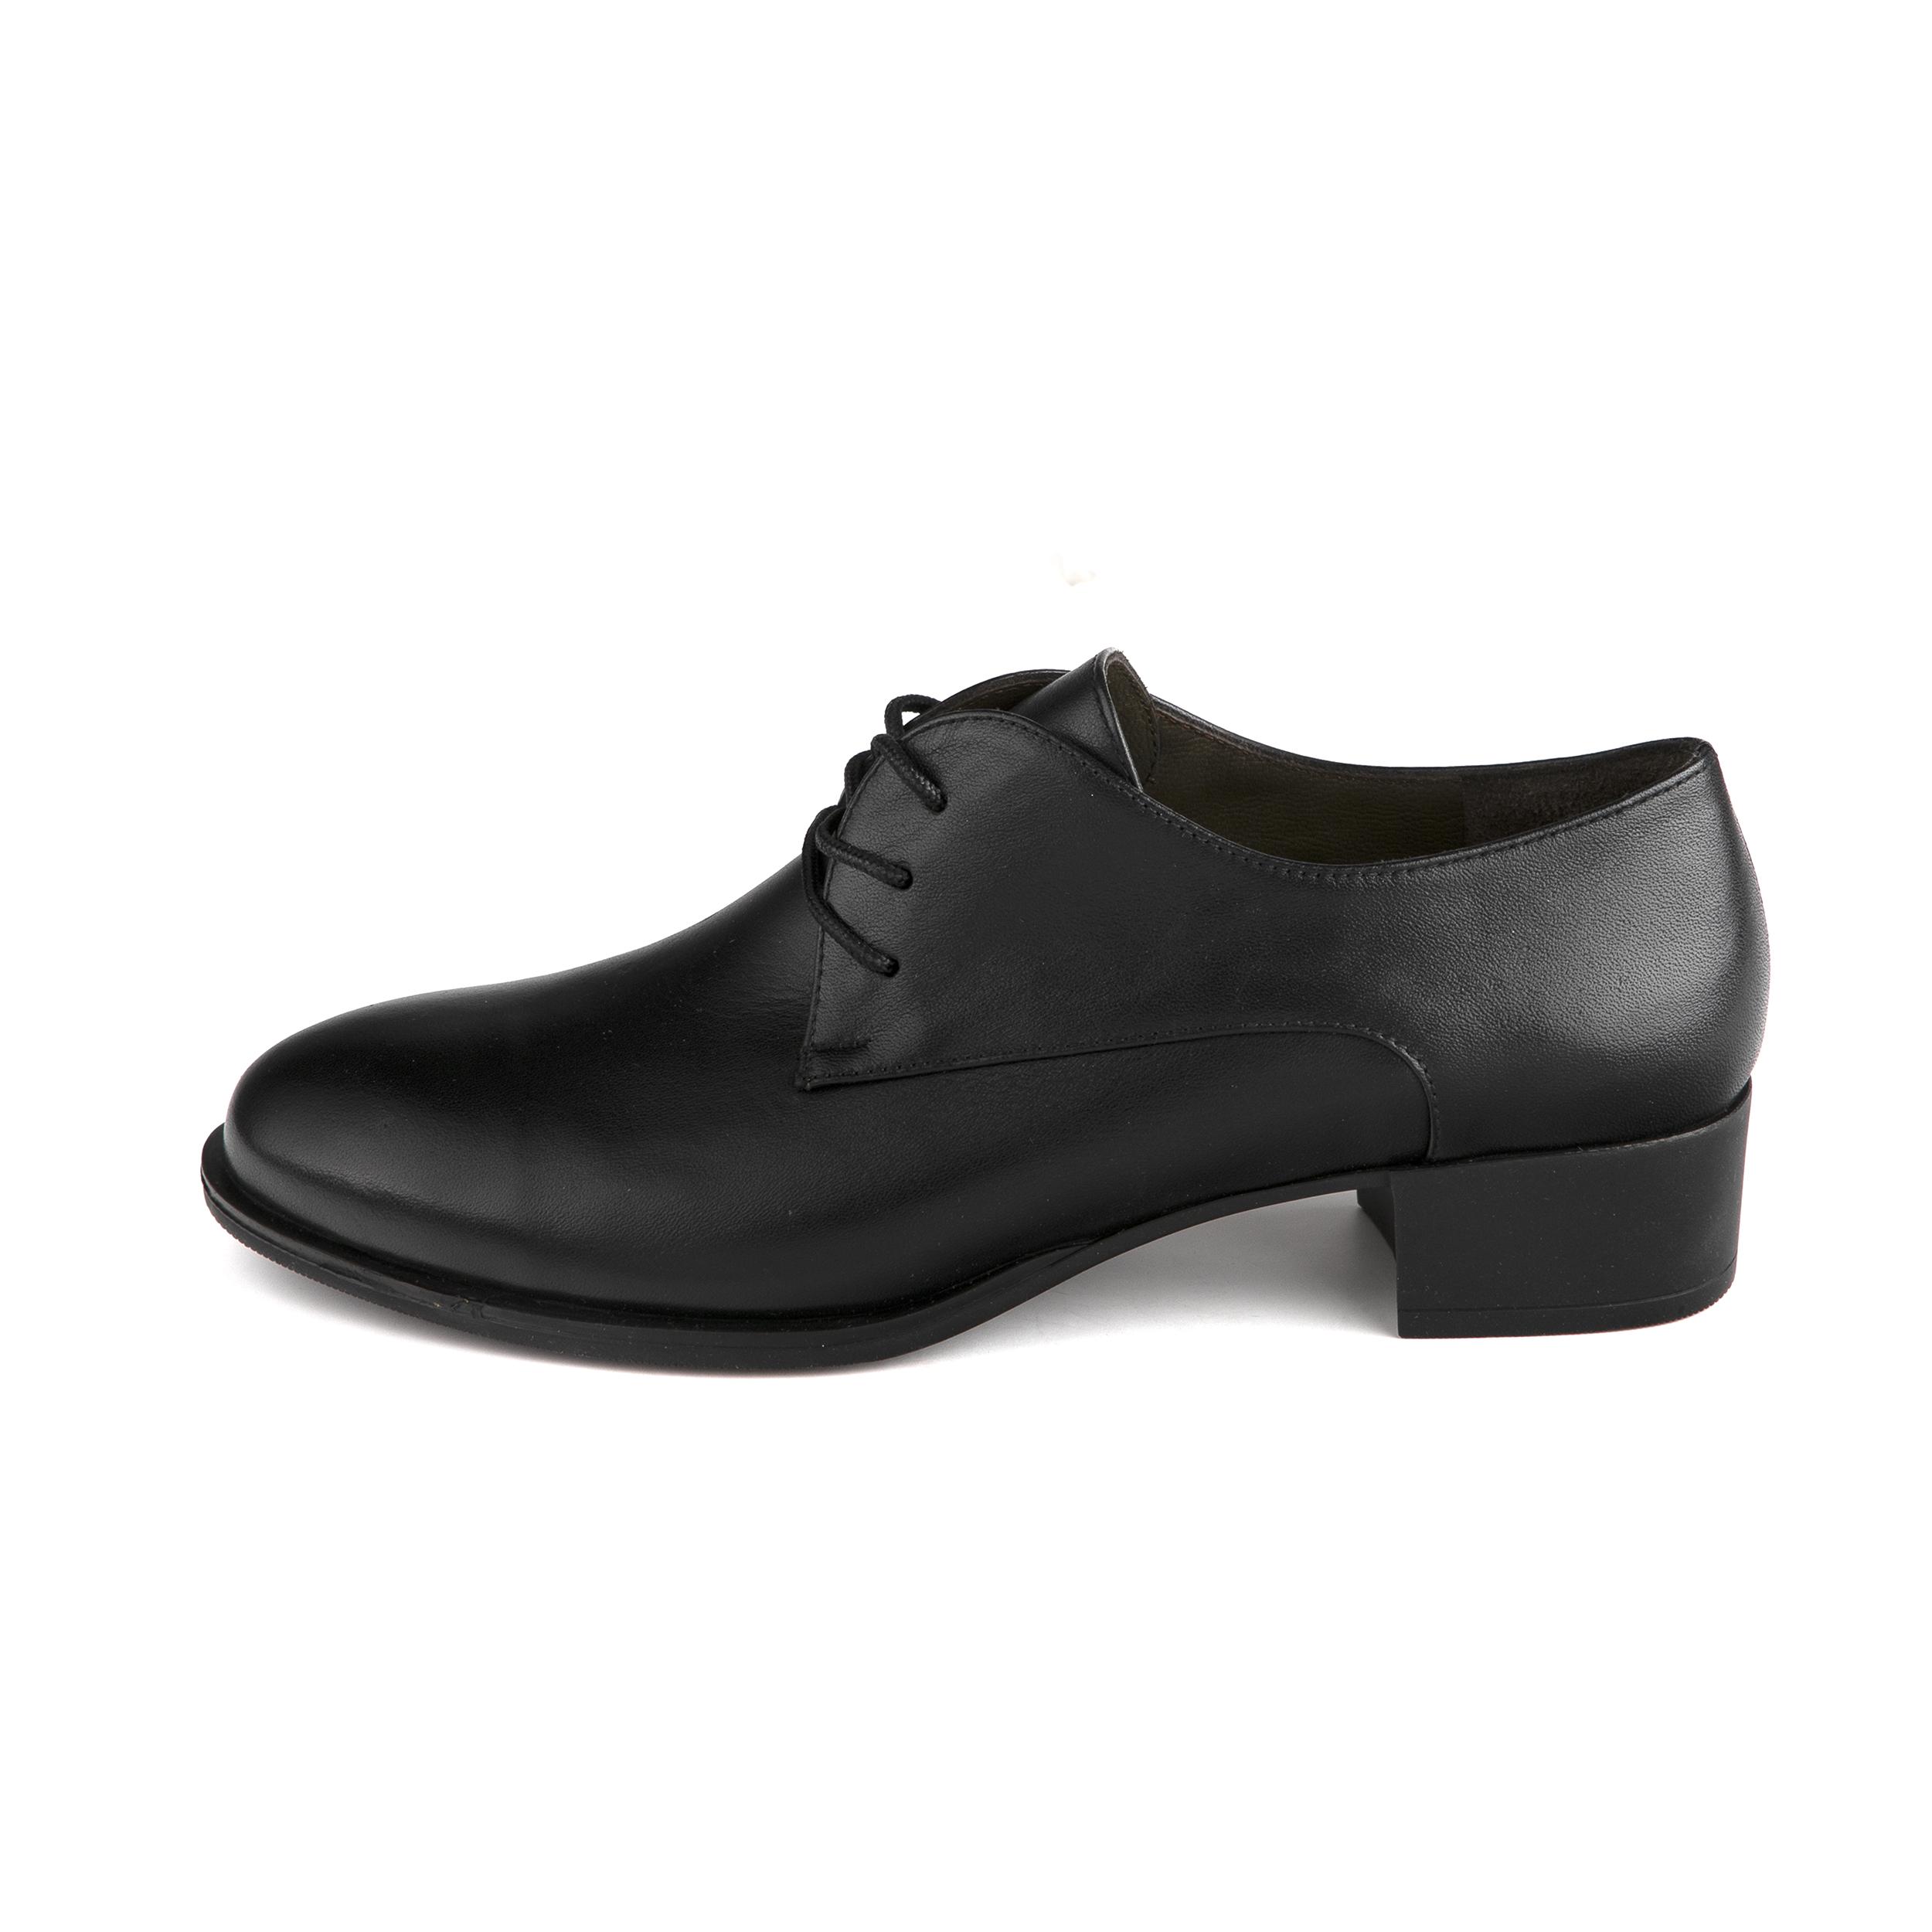 کفش زنانه آرتمن مدل Betty-42824-199